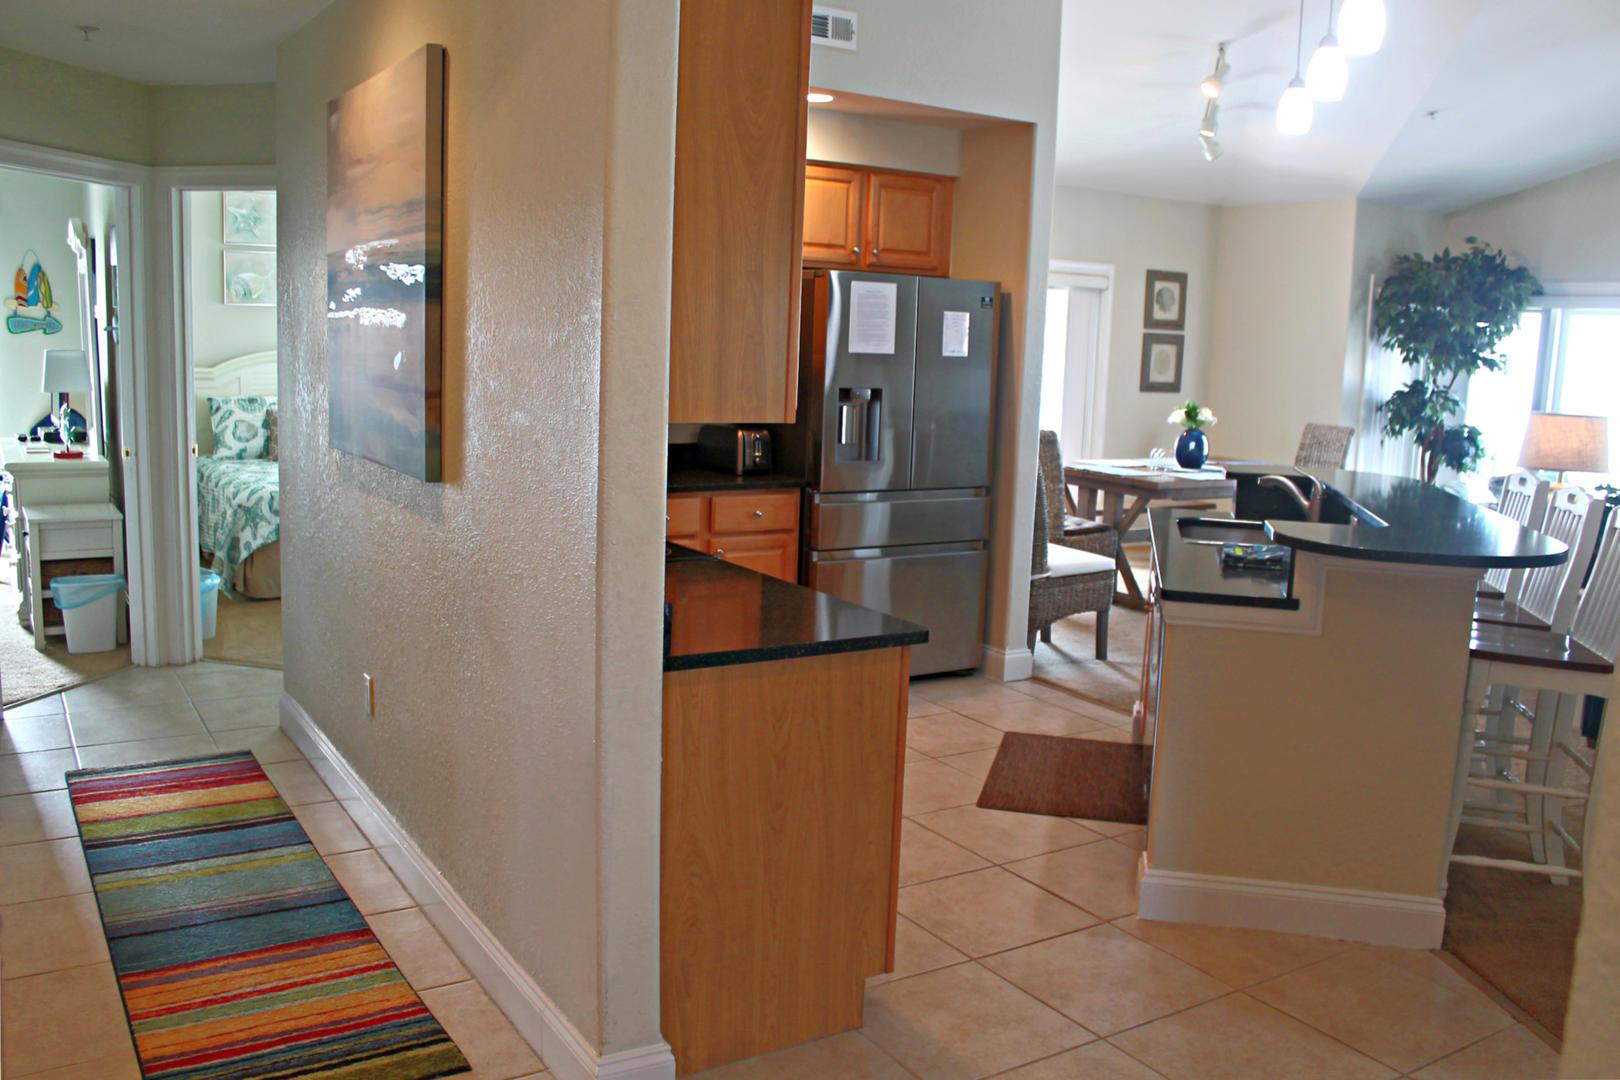 4100 Oceanside Condos 405 - Hallway and Kitchen